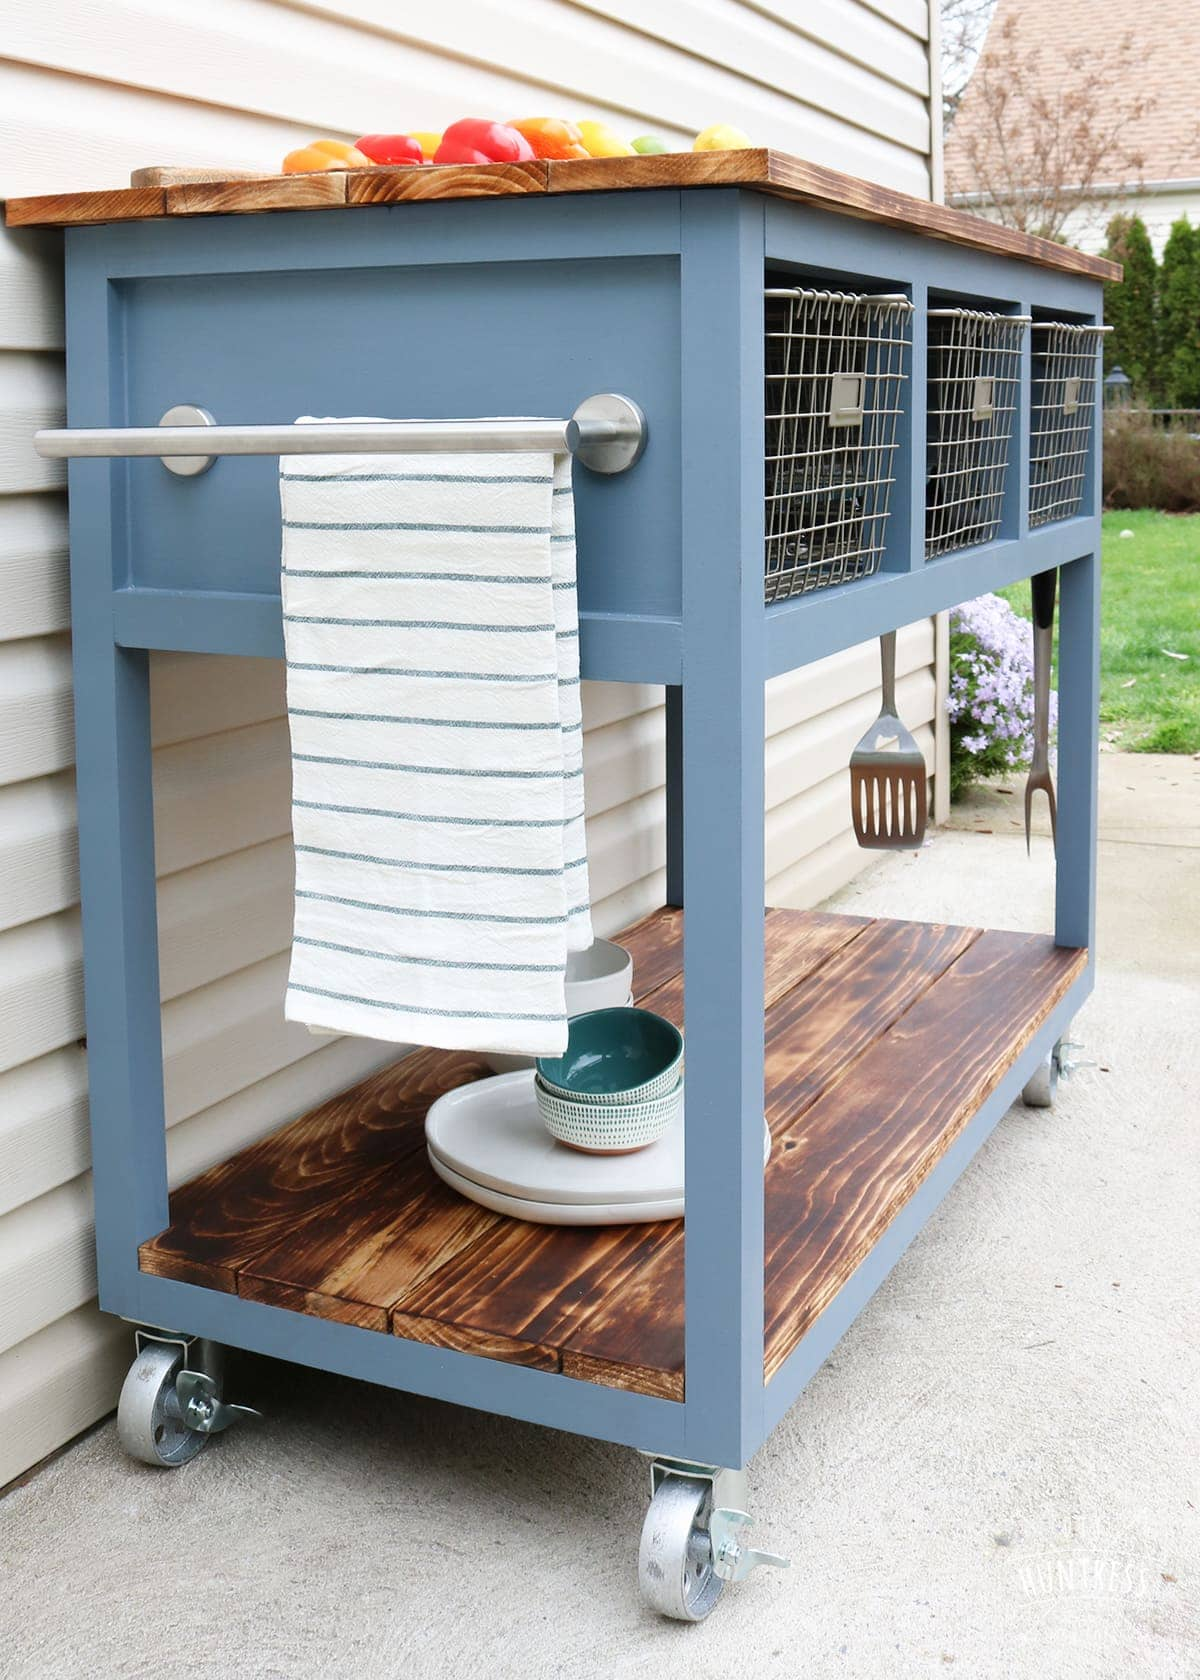 DIY-Mobile-Kitchen-Island-Grill-Cart-43 - DIY Huntress